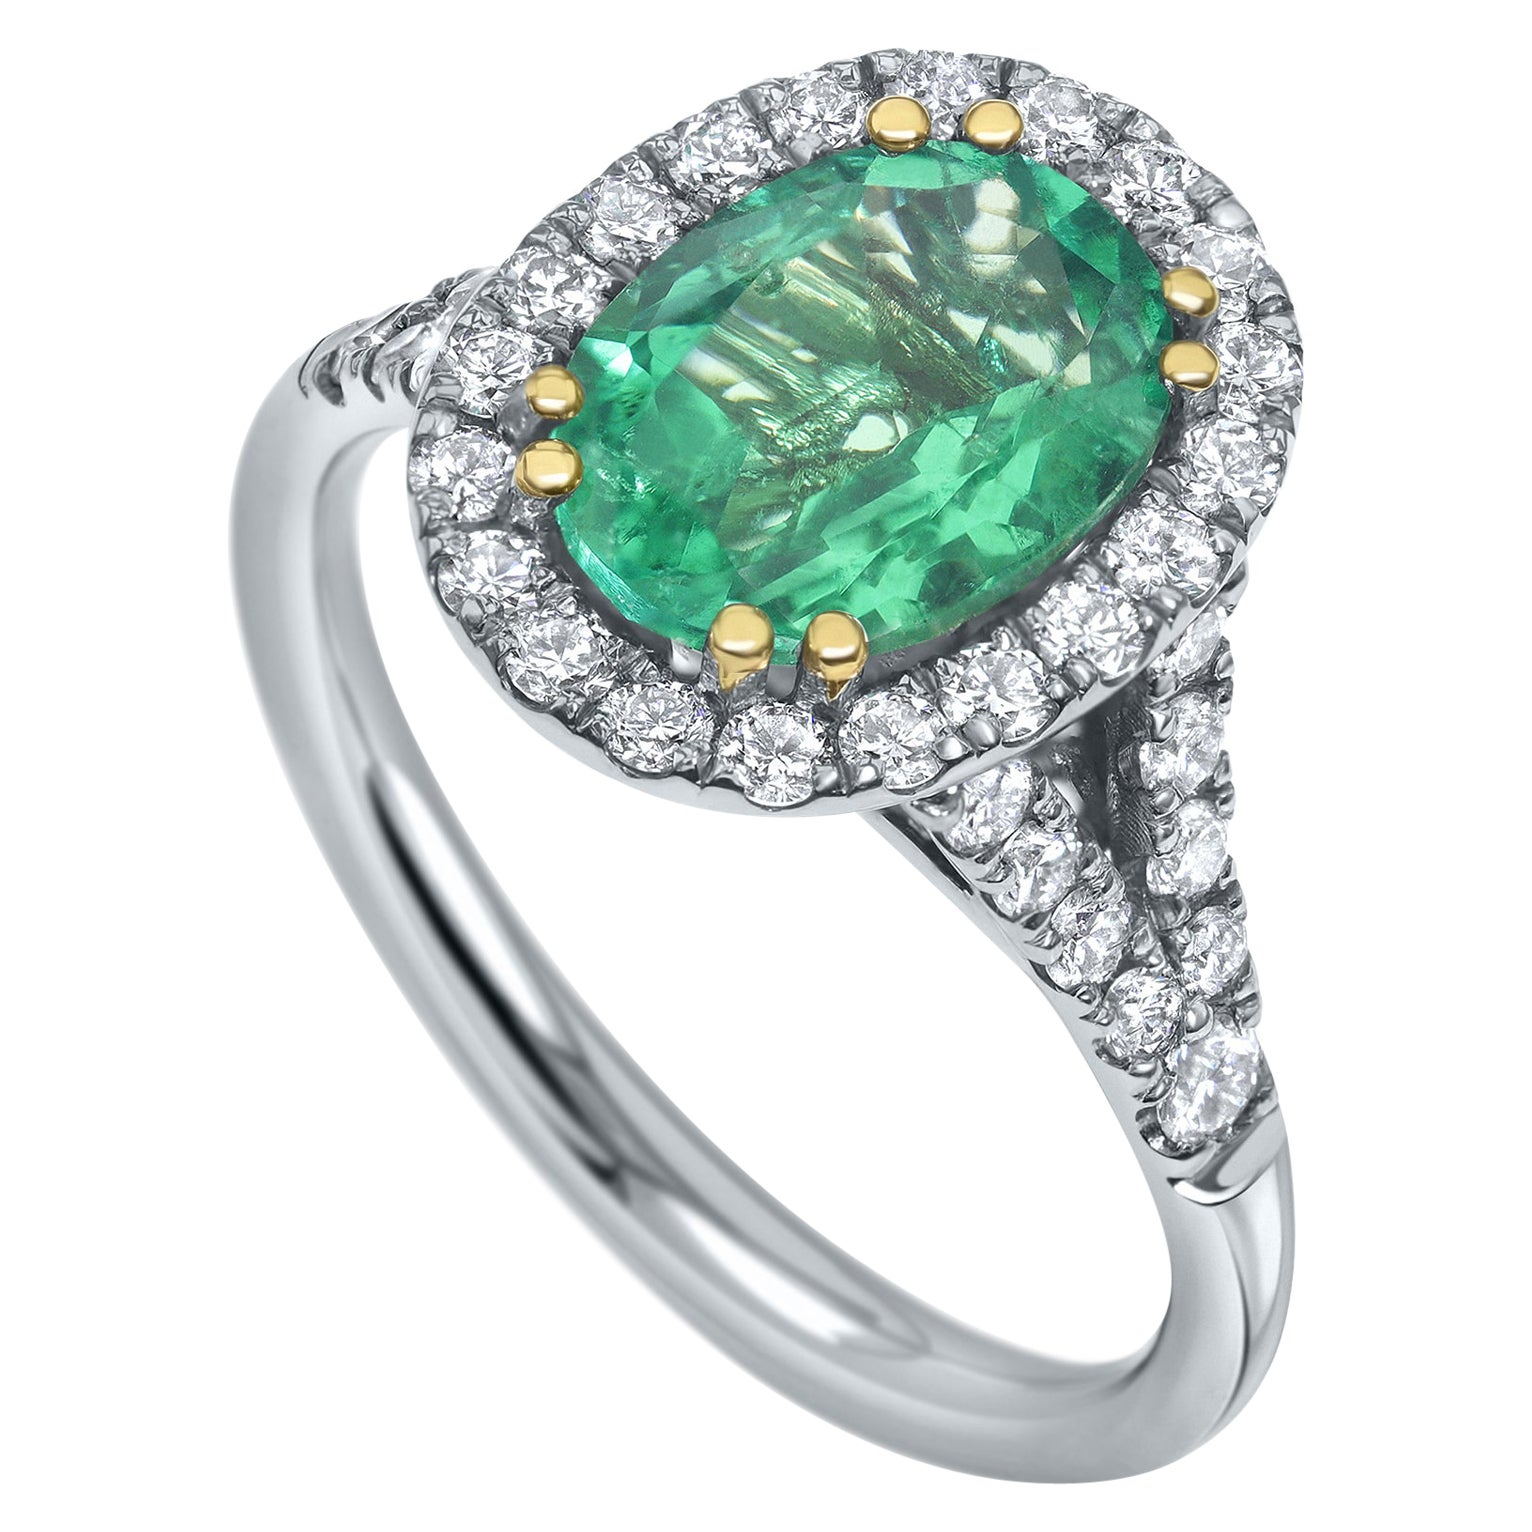 2.39 Carat IGL Certified Natural Afghan Emerald and Diamonds Ring -Shlomit Rogel